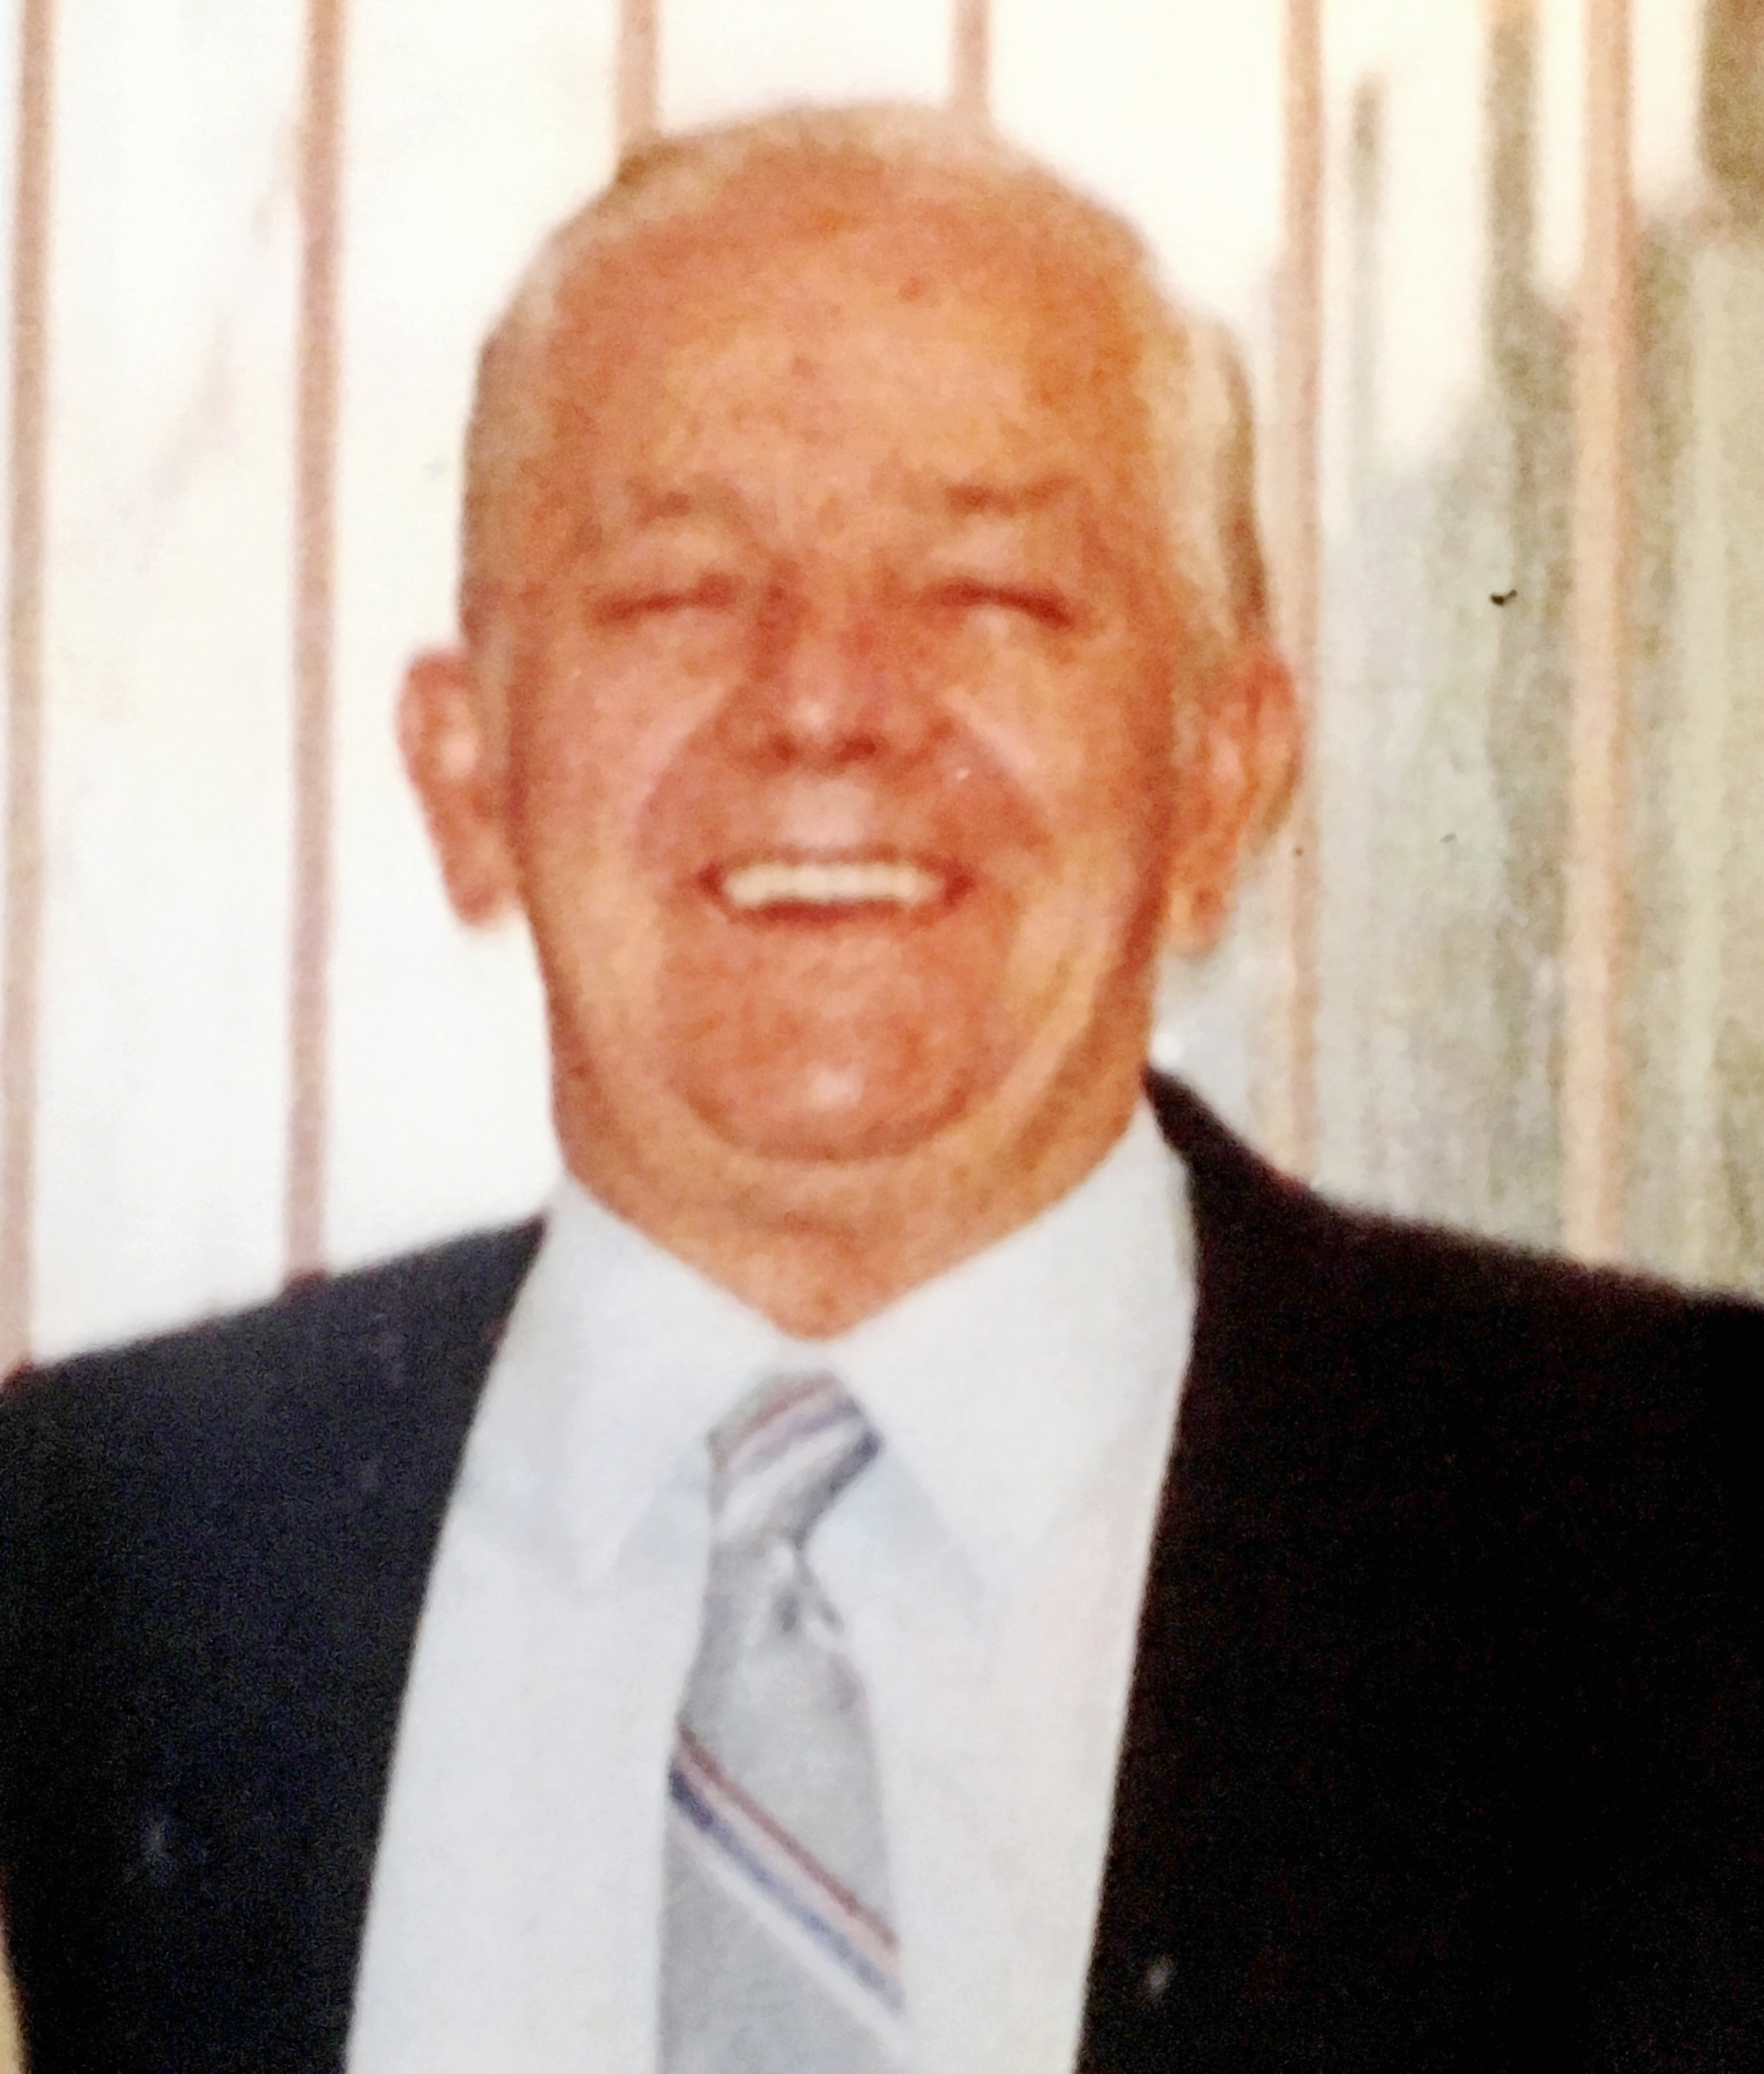 DONALD CLAYTON LEWIS SR.